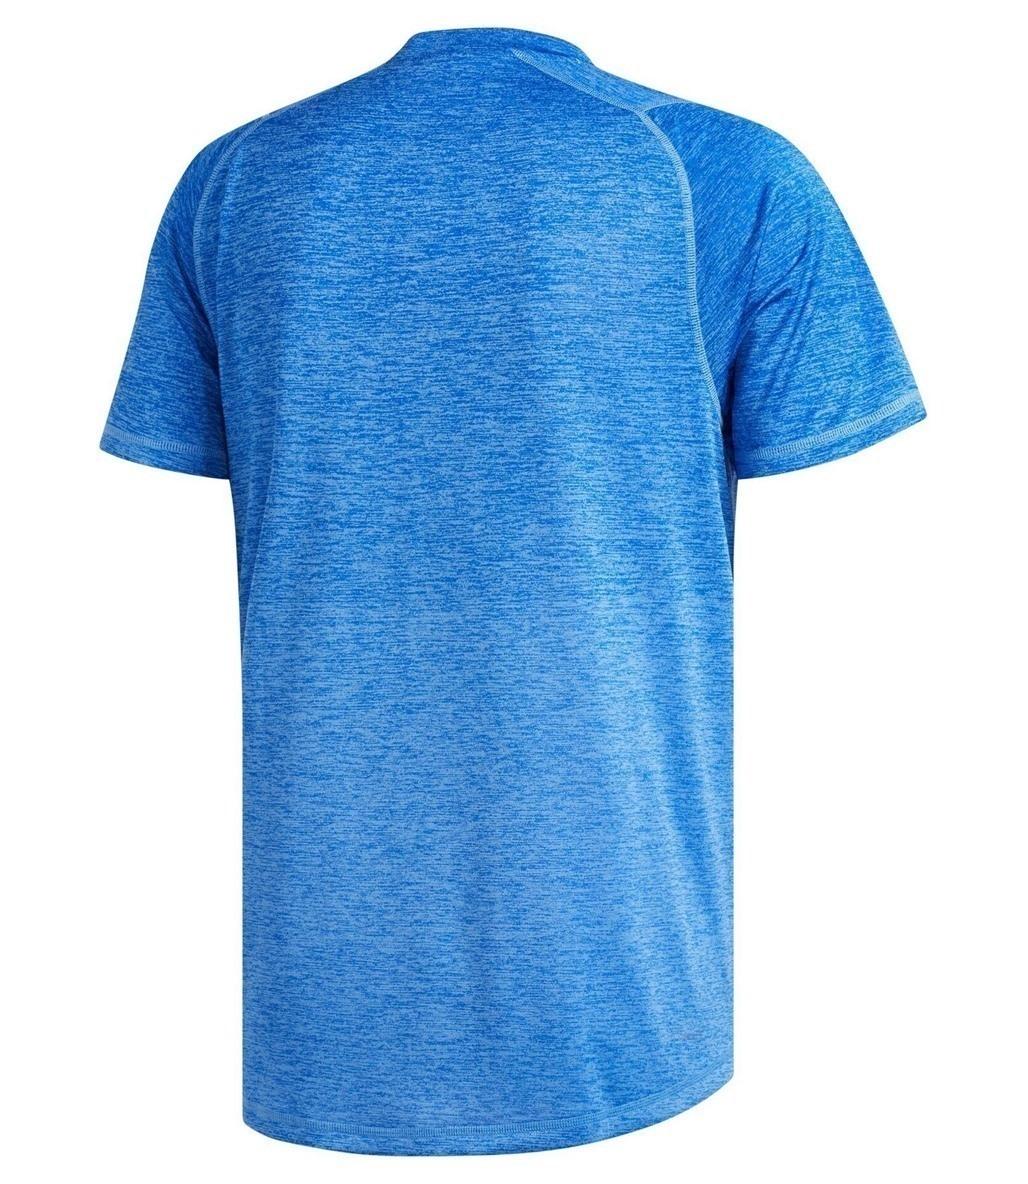 Adidas Freelift 360 Gradient Graphic T-Shirt Mavi